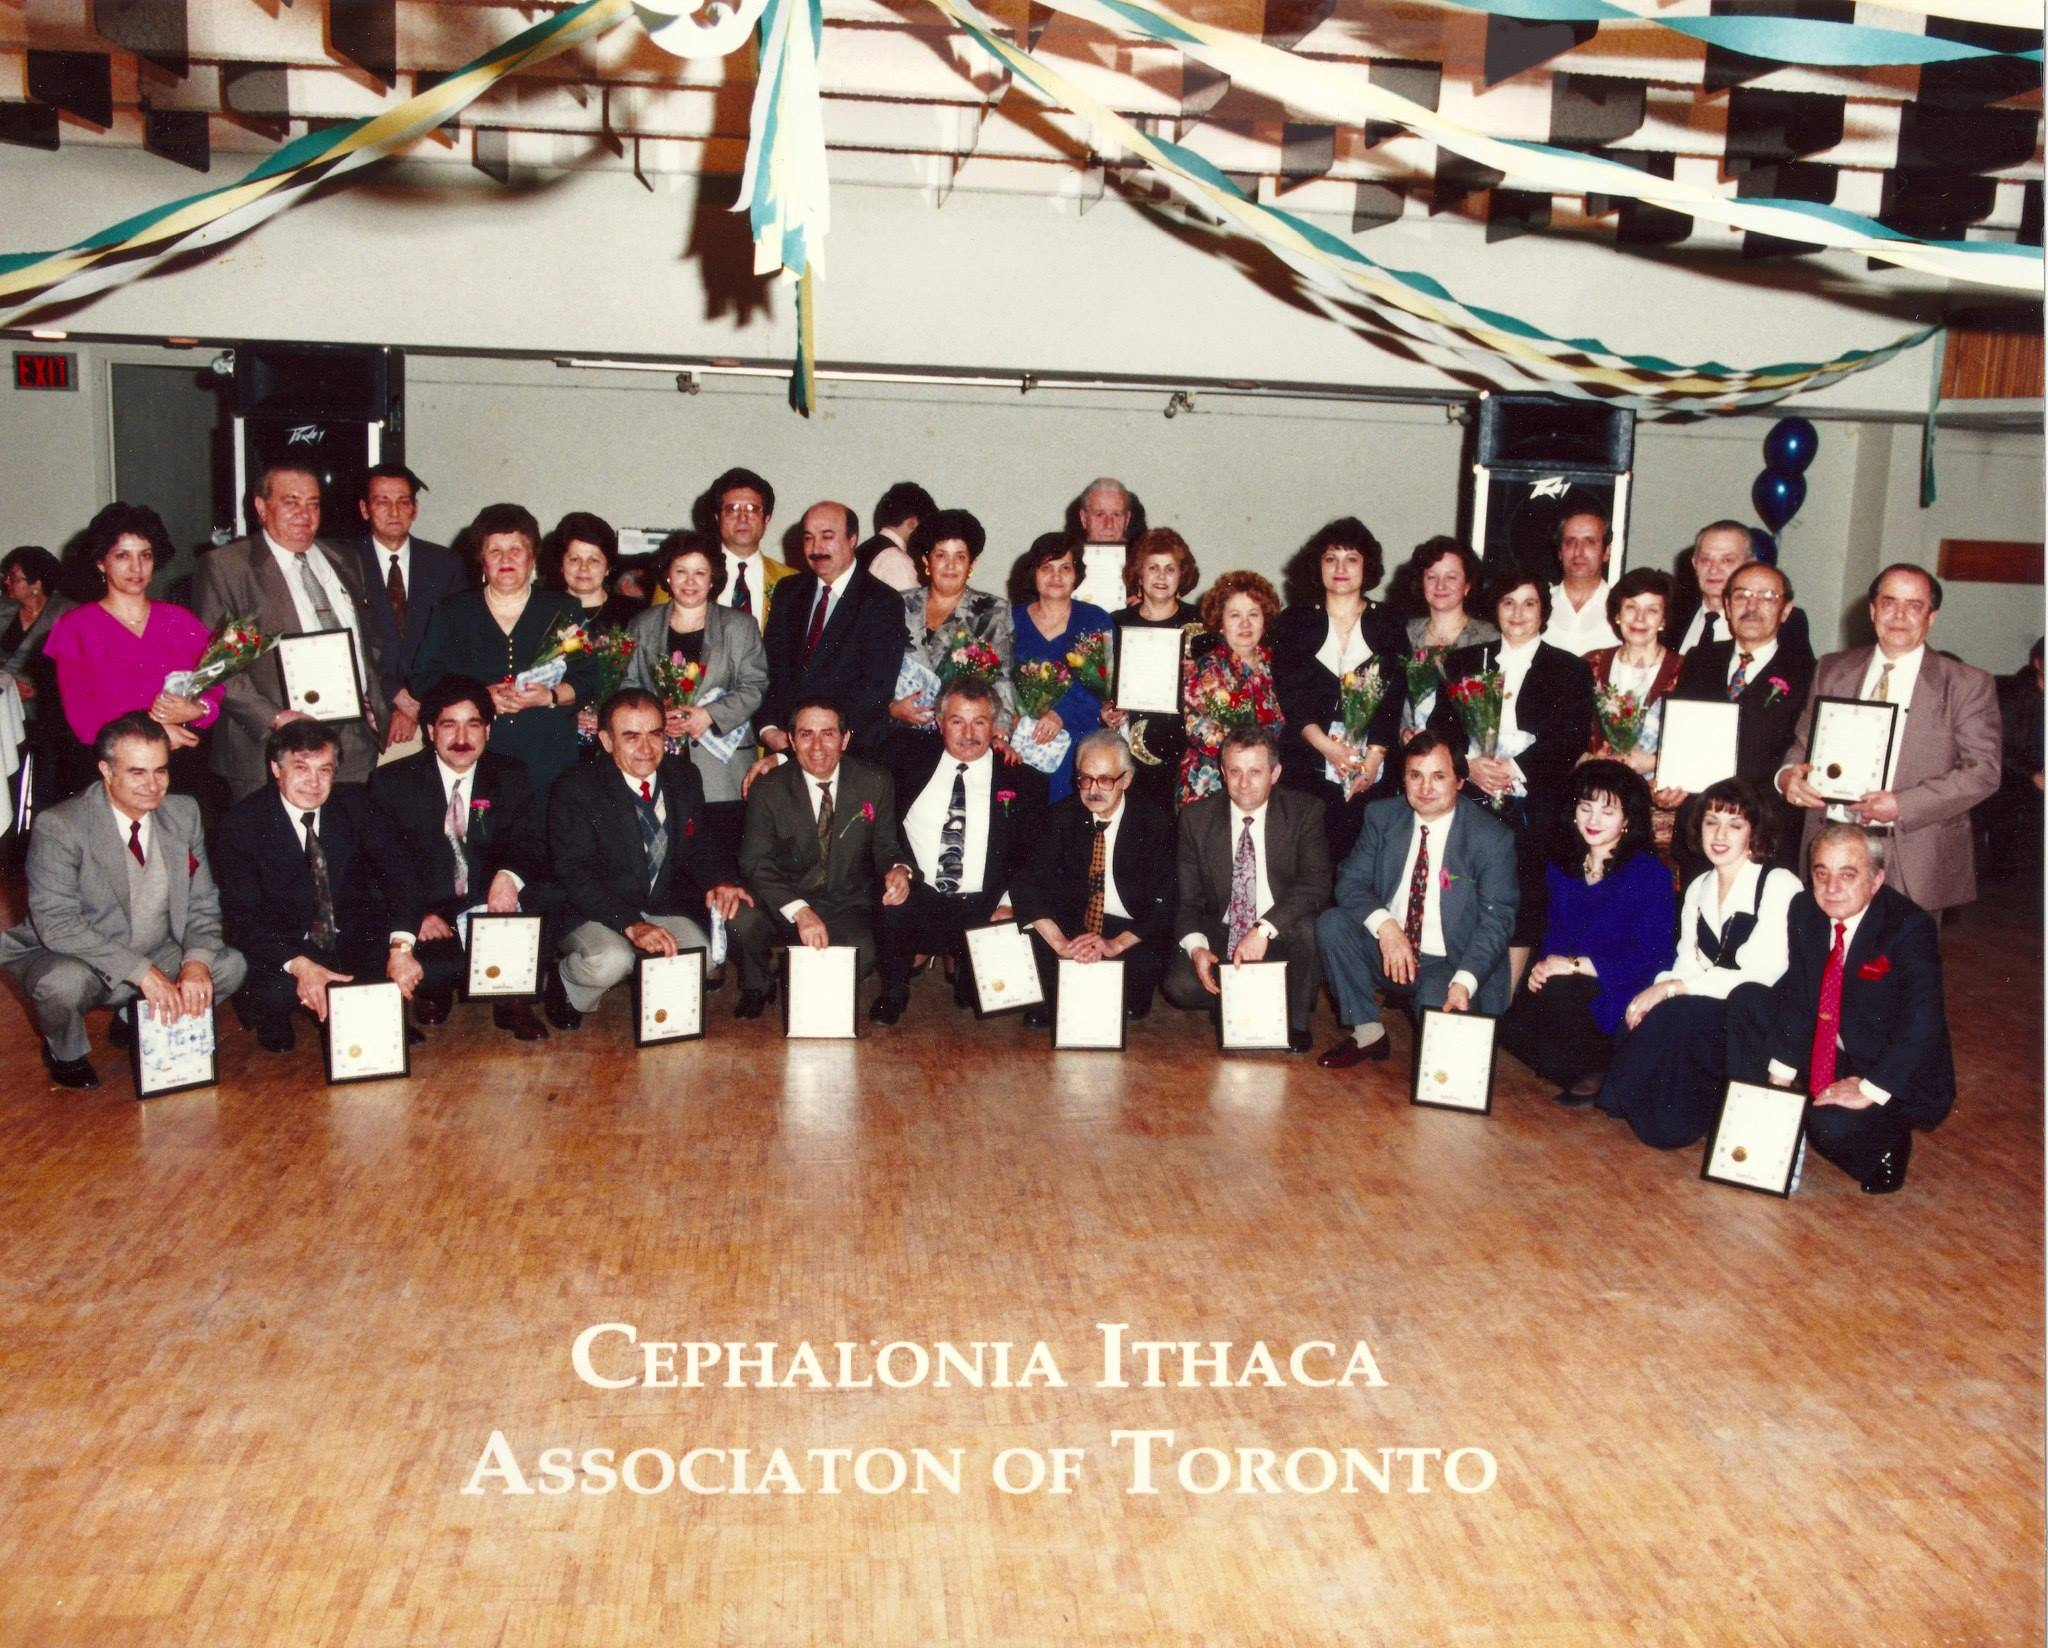 Cephalonia Association Toronto